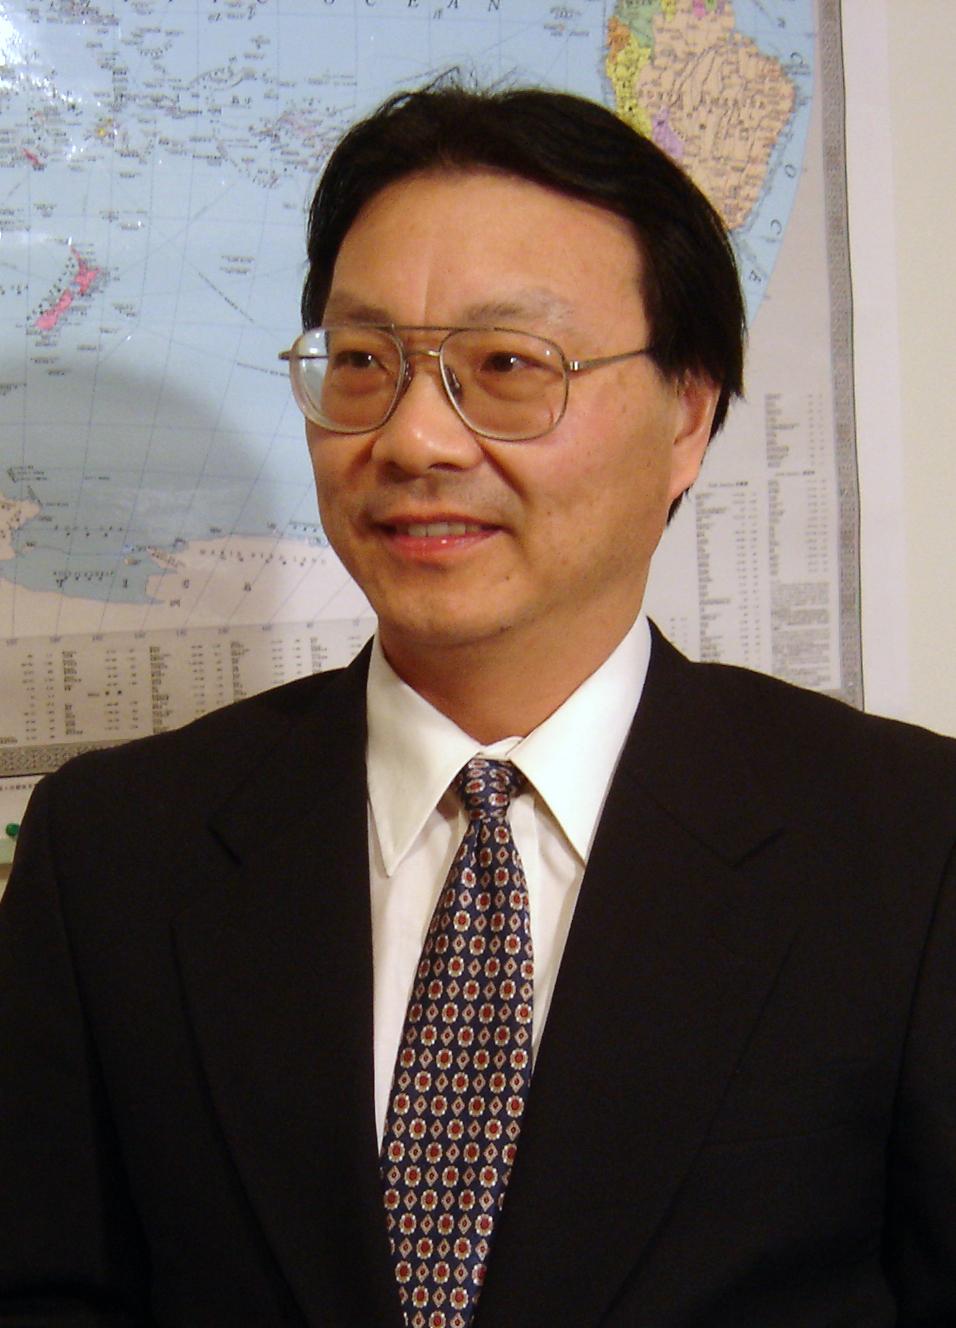 Prof. Liu Kang